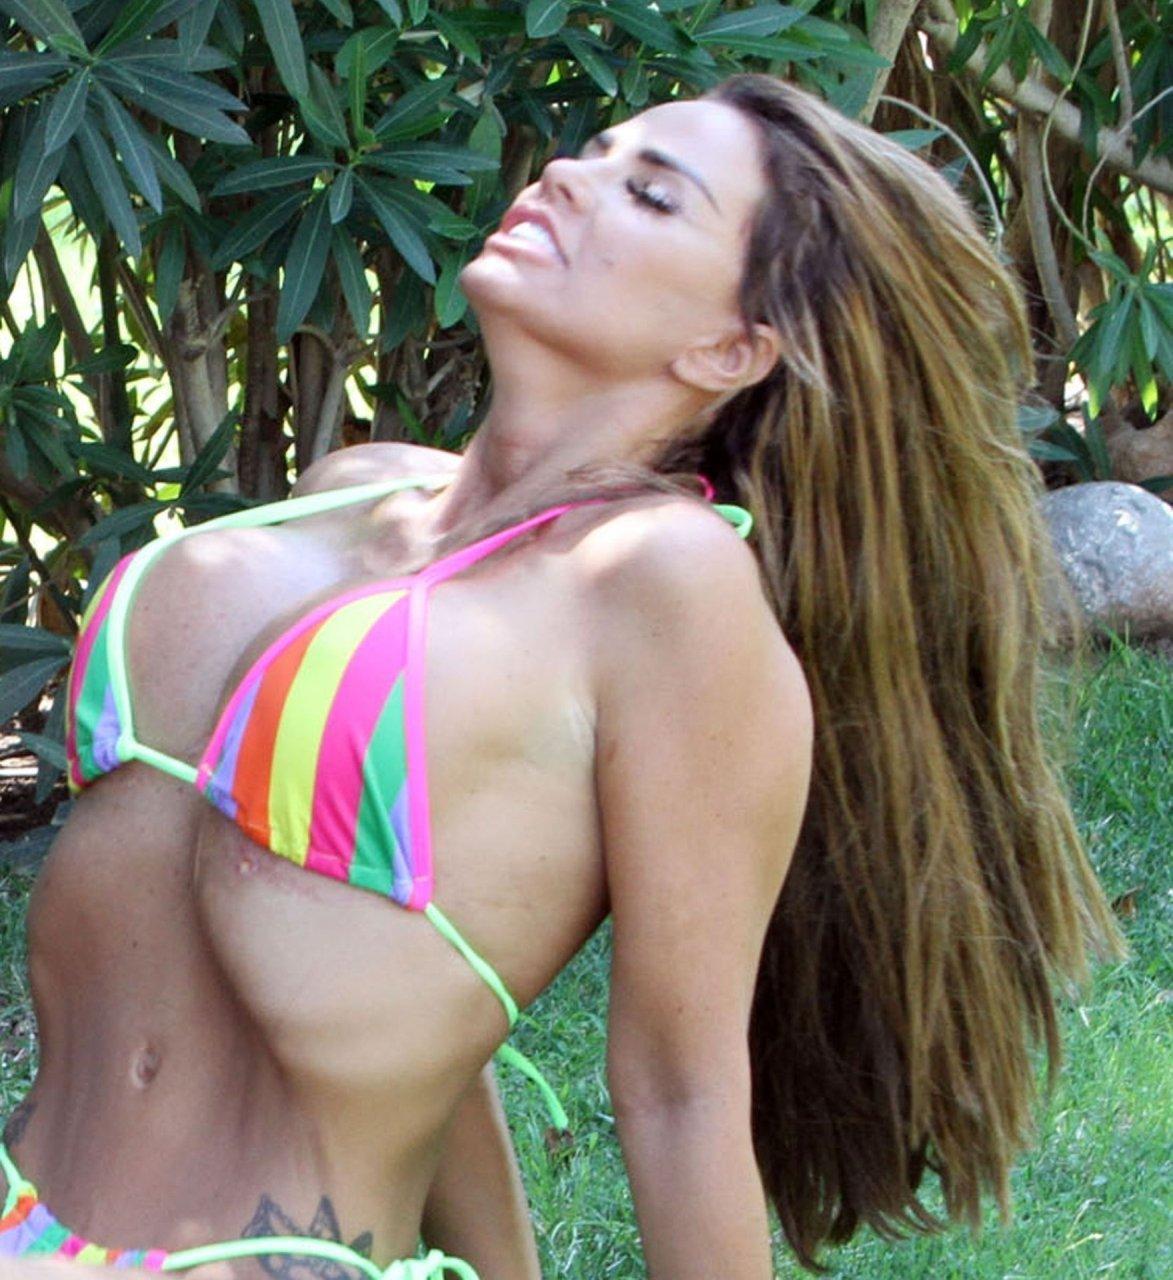 Katie-Price-Nude-Sexy-TheFappeningBlog.com-66.jpg